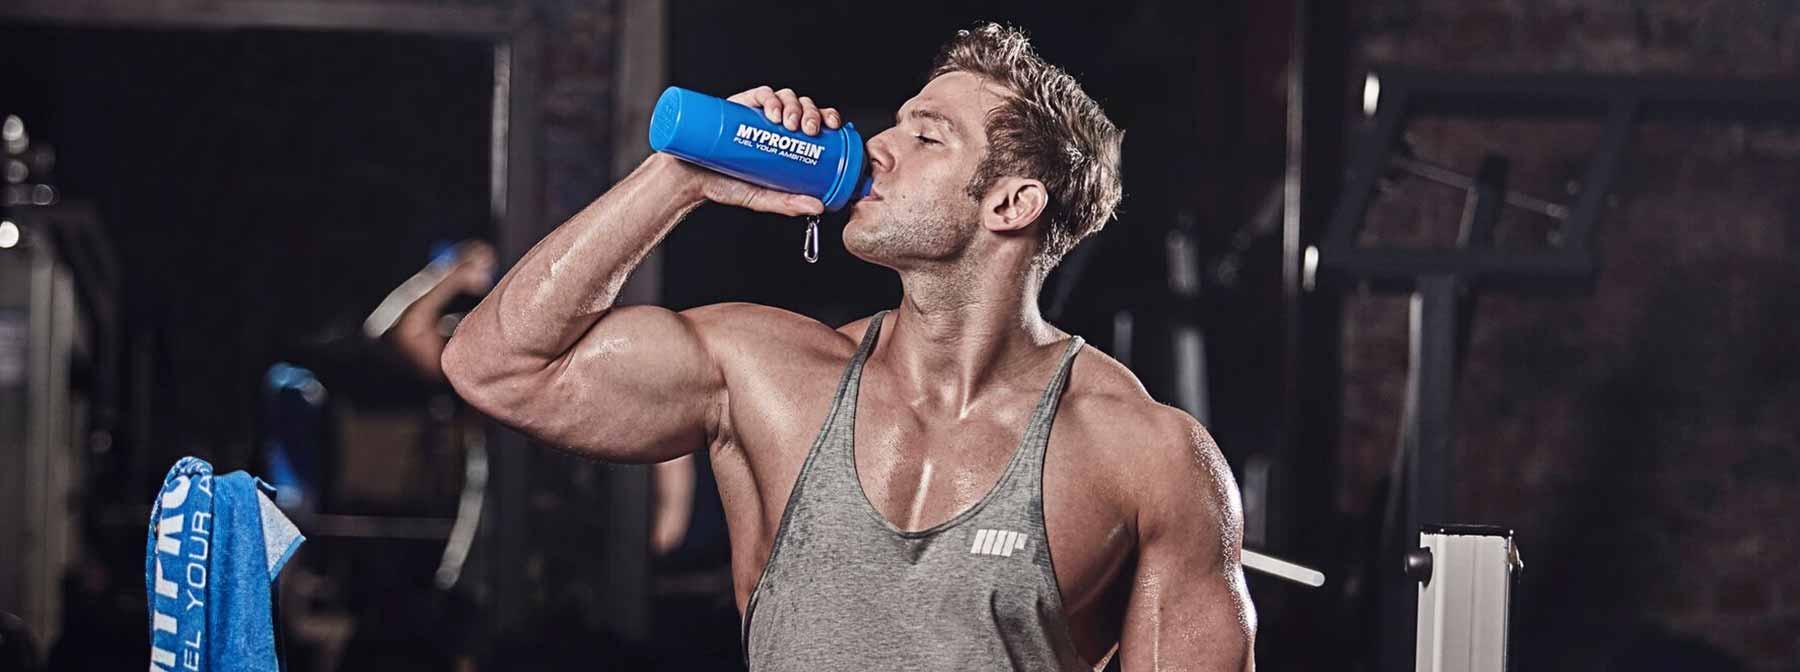 1800x672-male-nutrition